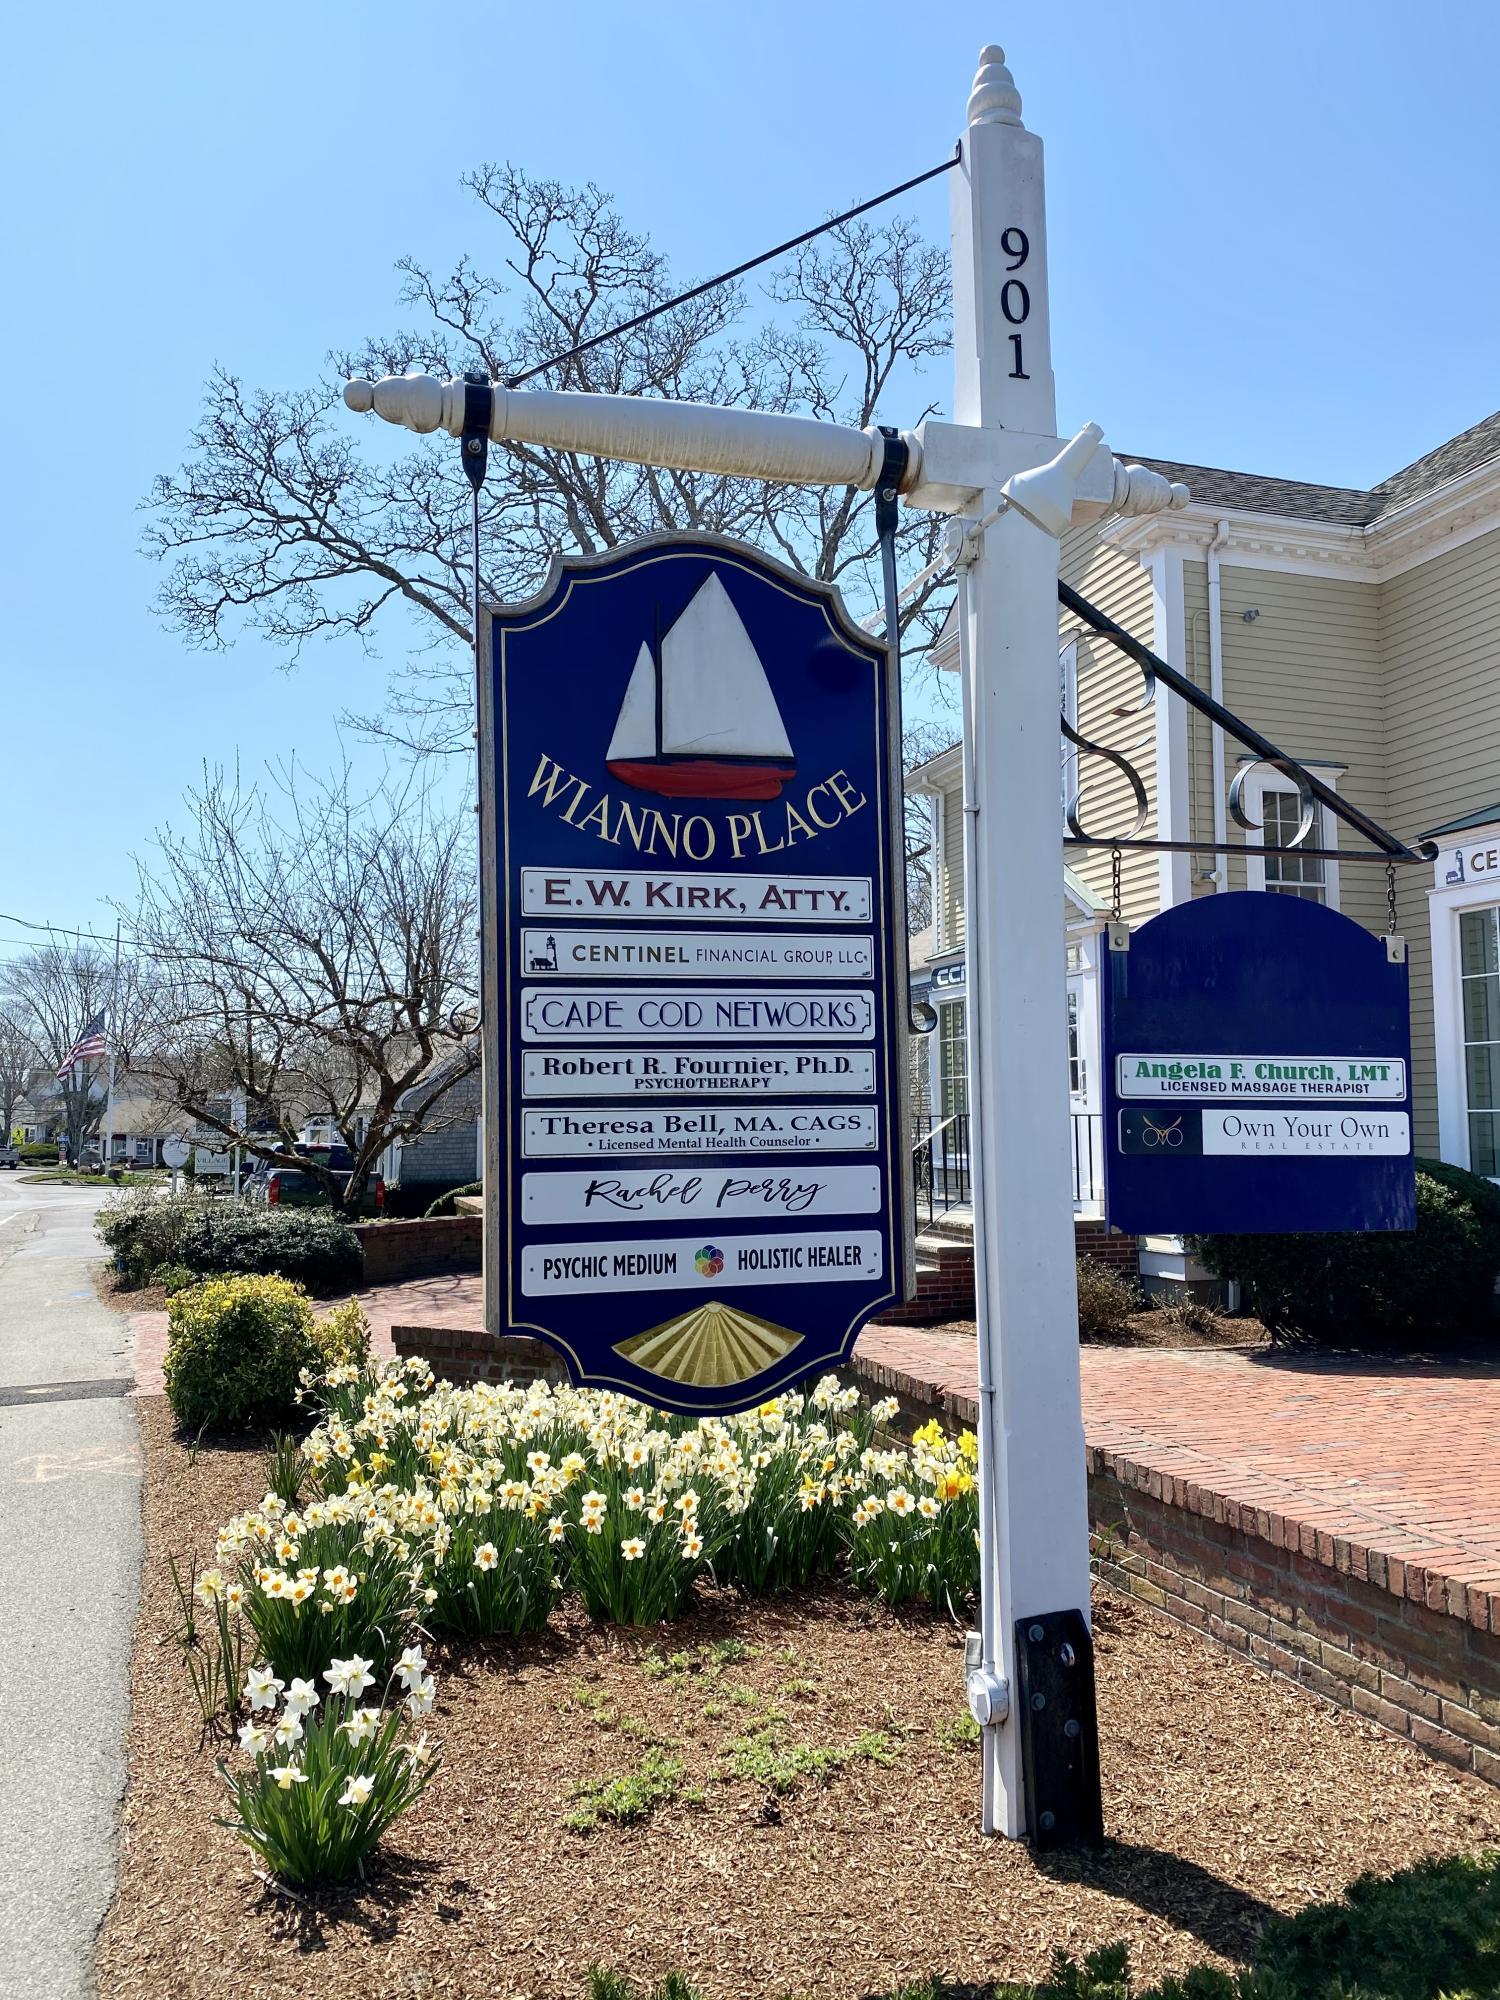 901 Main Street, Osterville MA, 02655 details